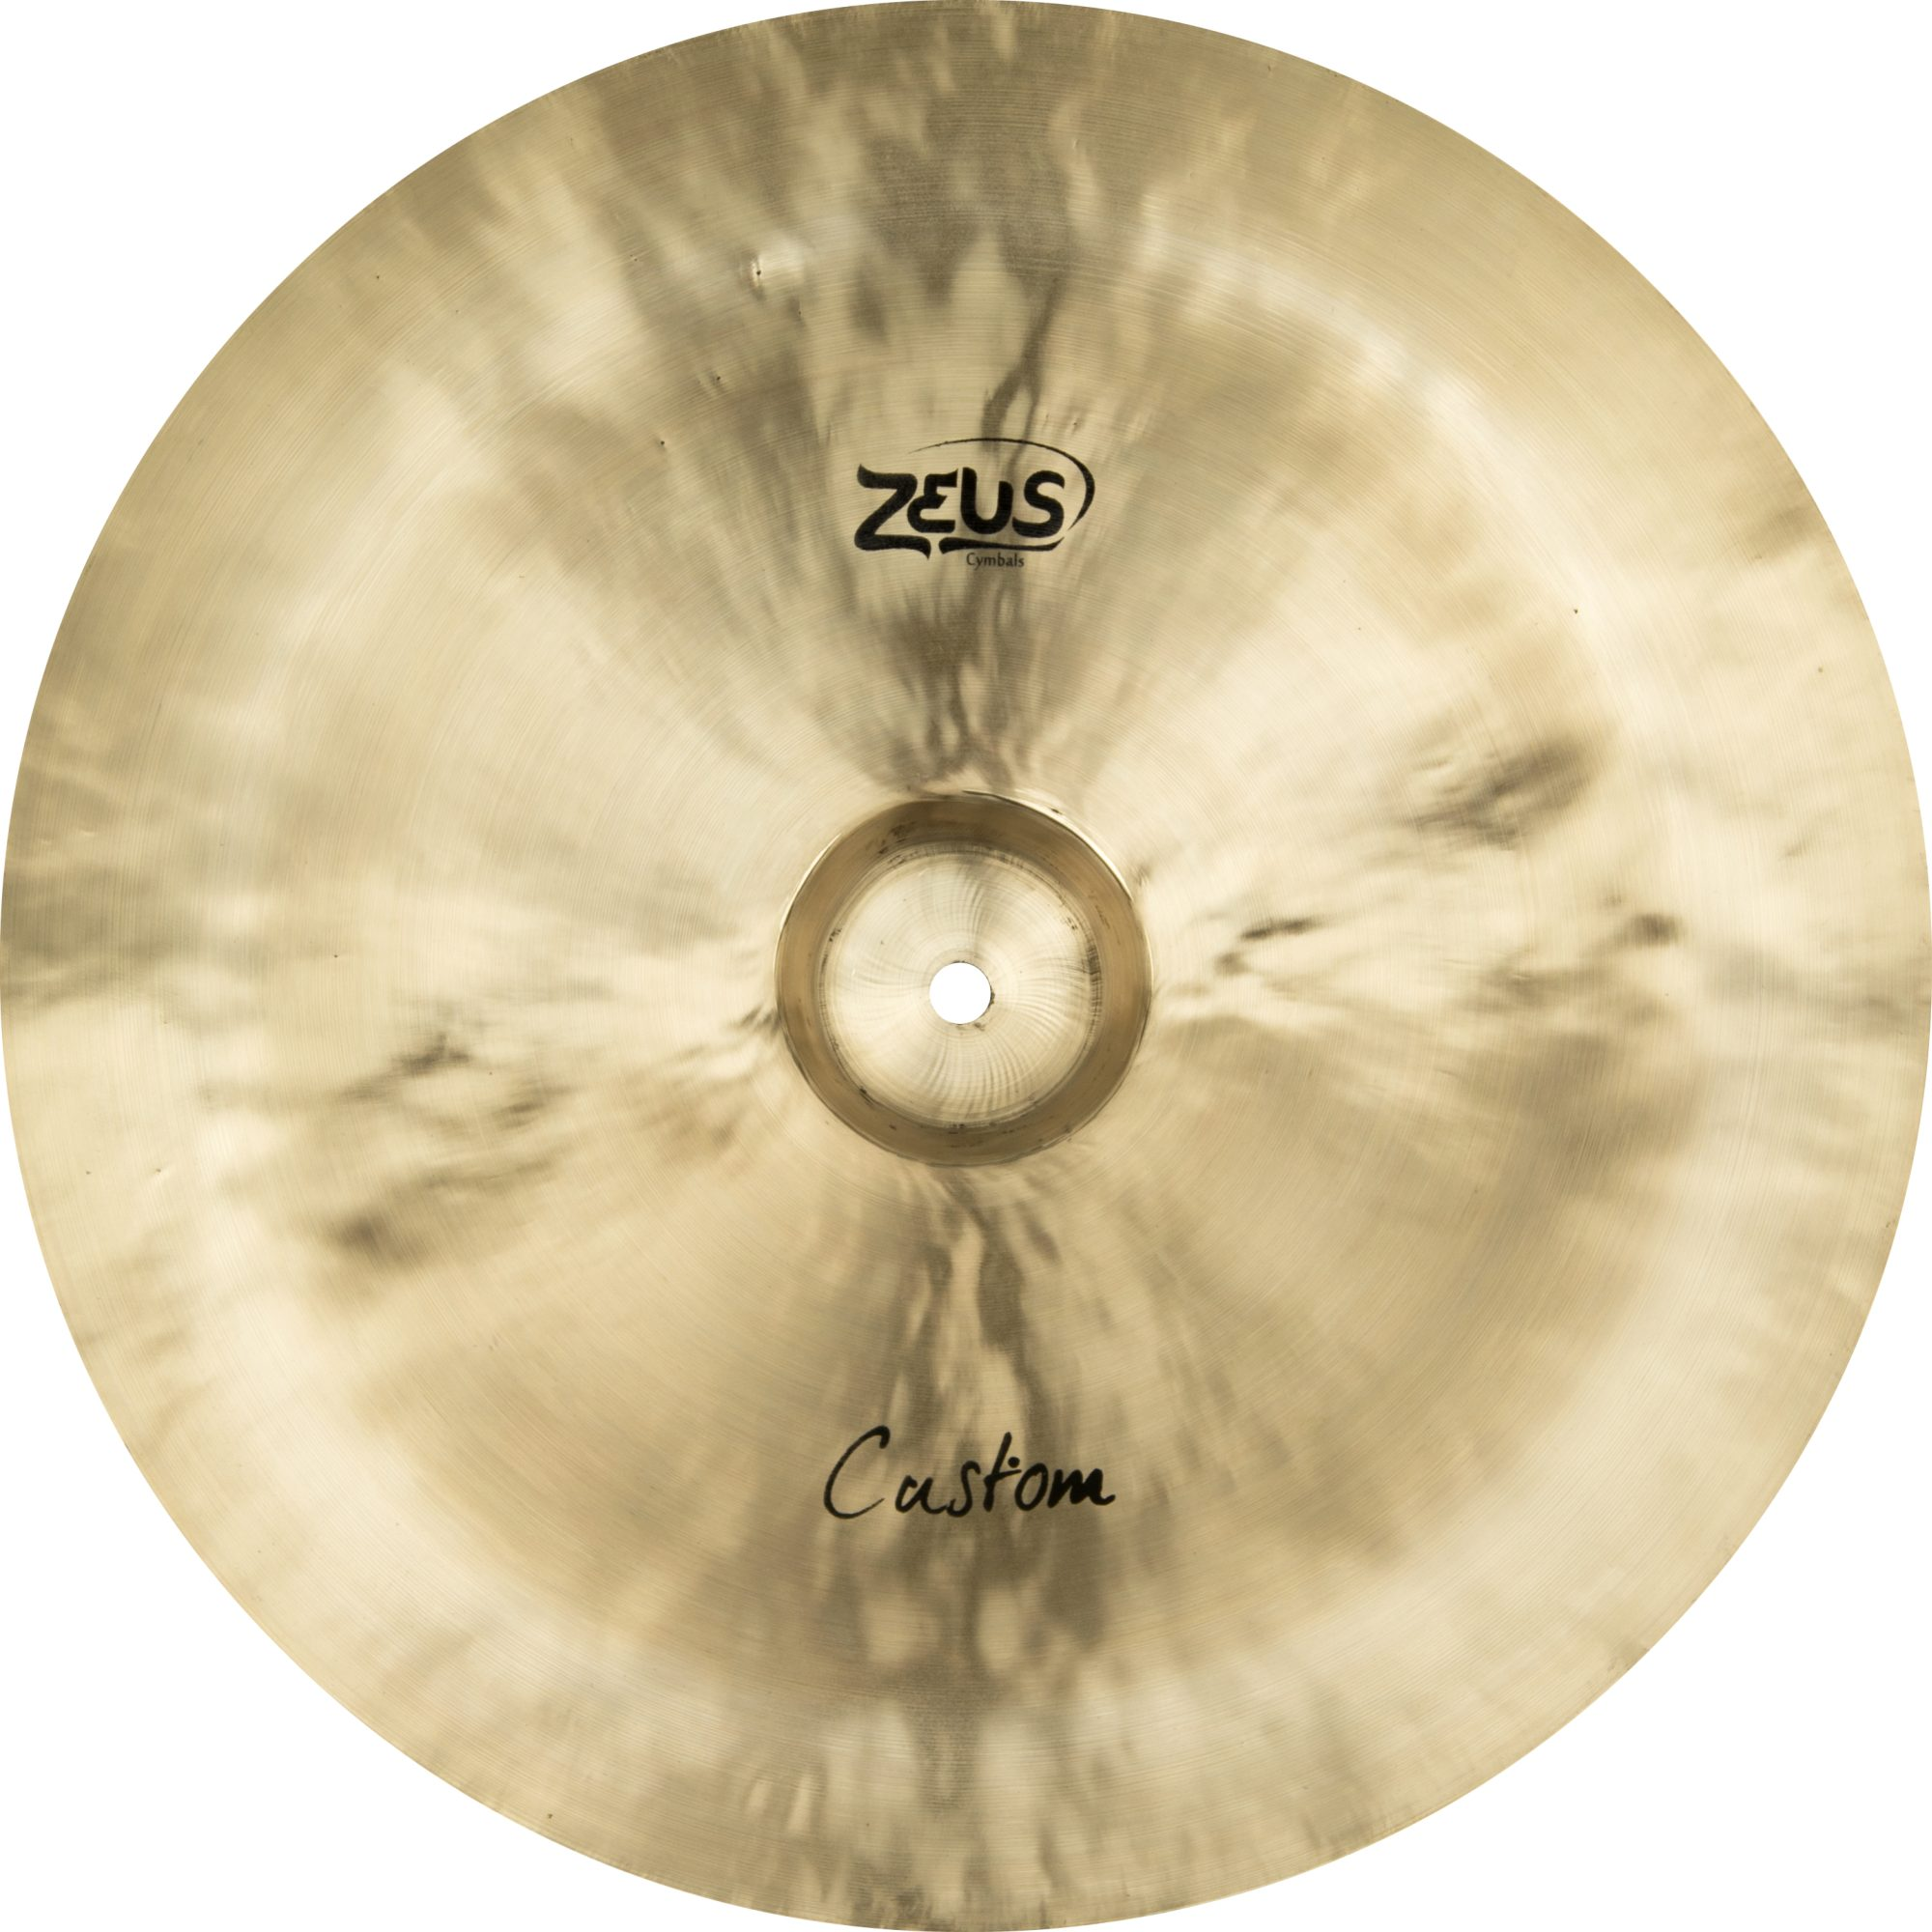 Prato Zeus Custom China 18 Zcch18